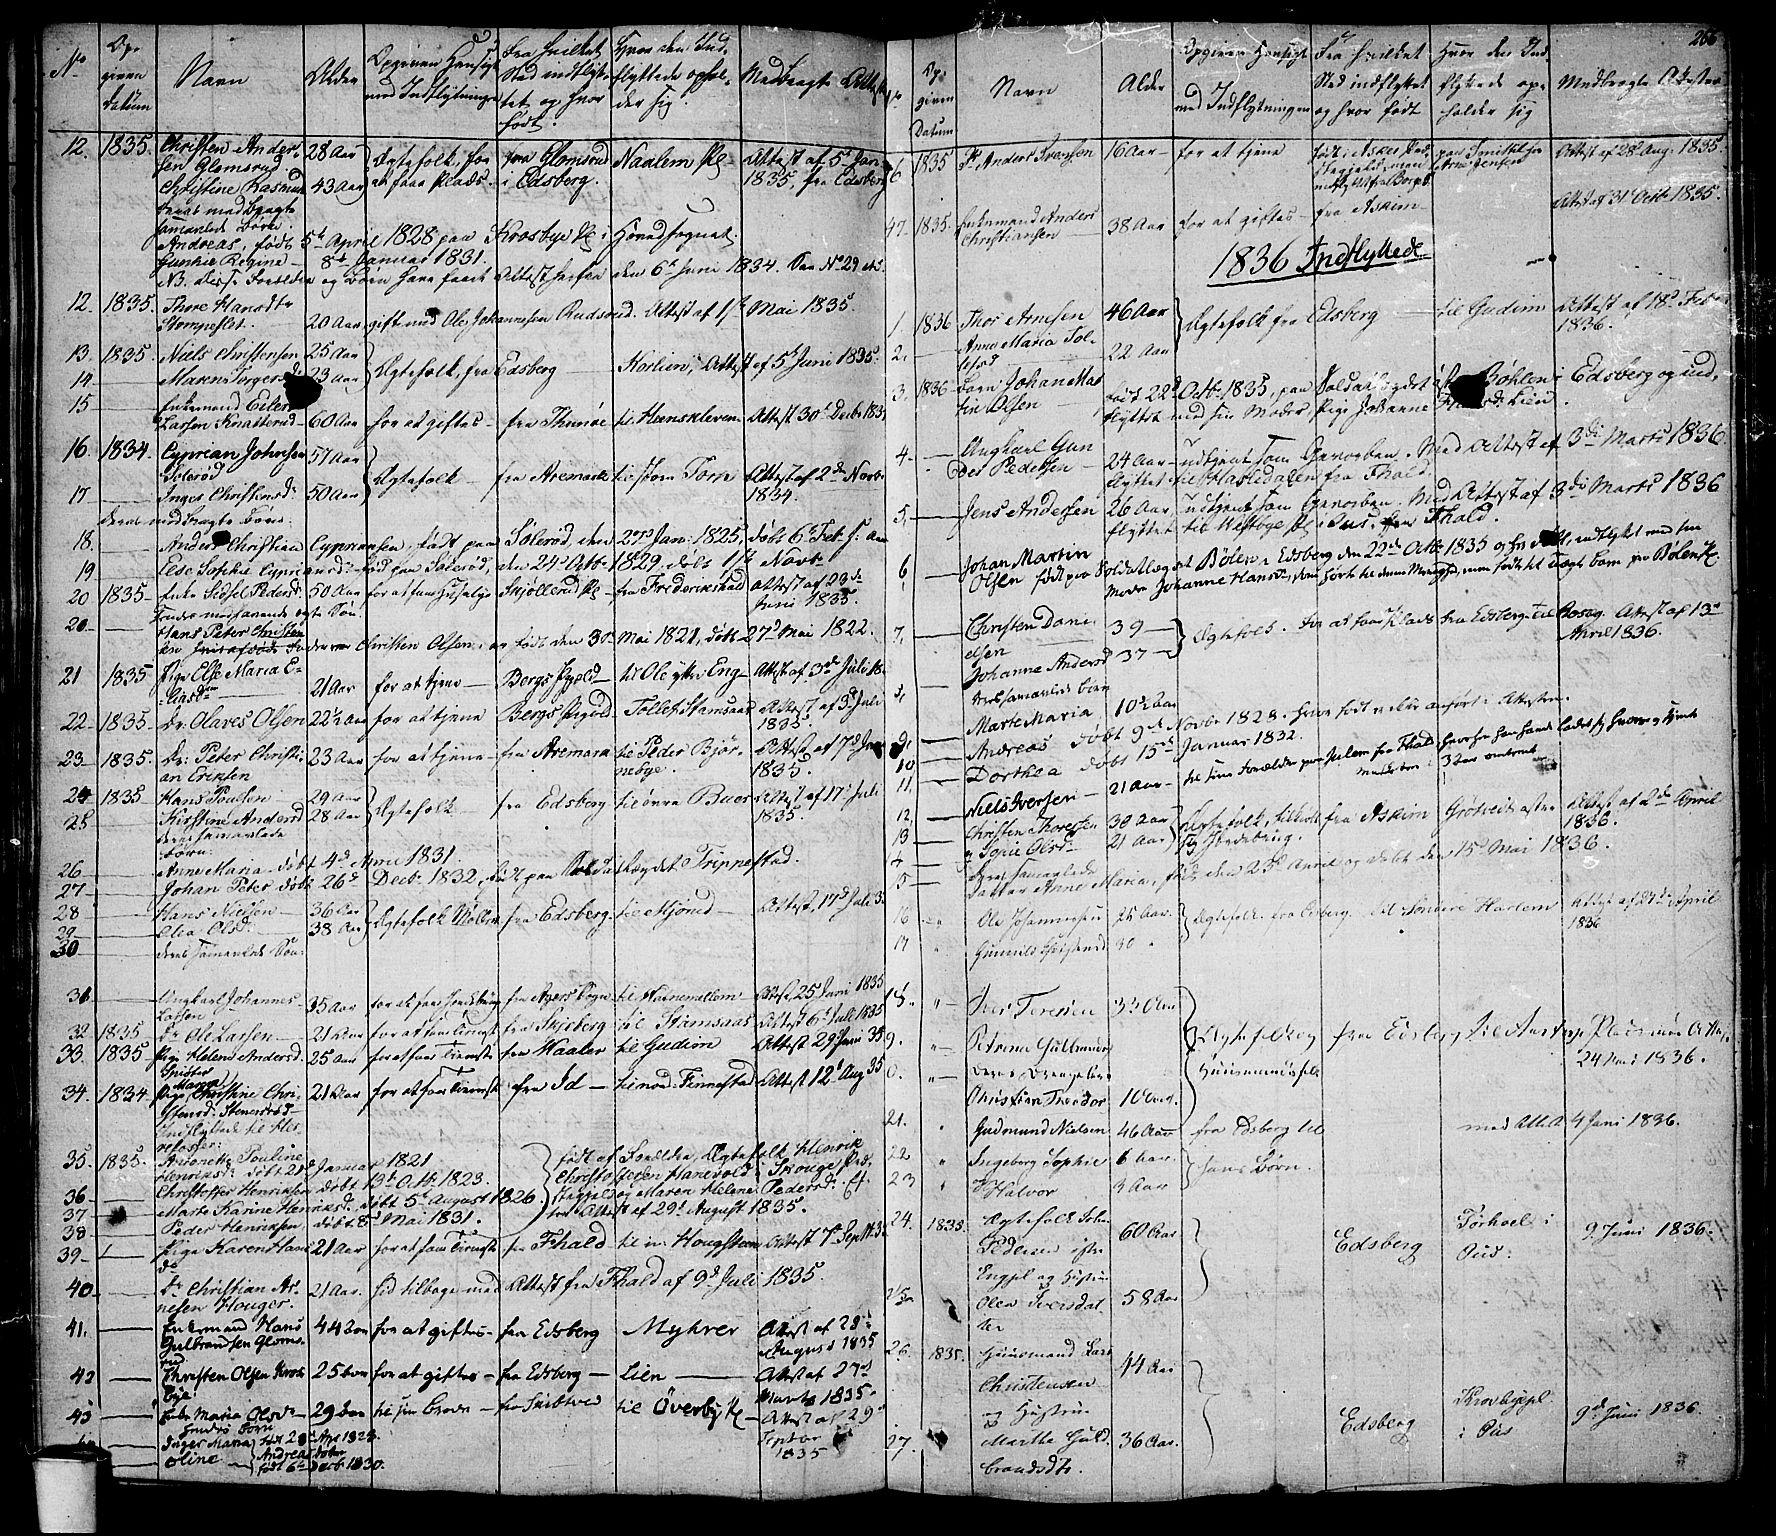 SAO, Rakkestad prestekontor Kirkebøker, F/Fa/L0007: Ministerialbok nr. I 7, 1825-1841, s. 256